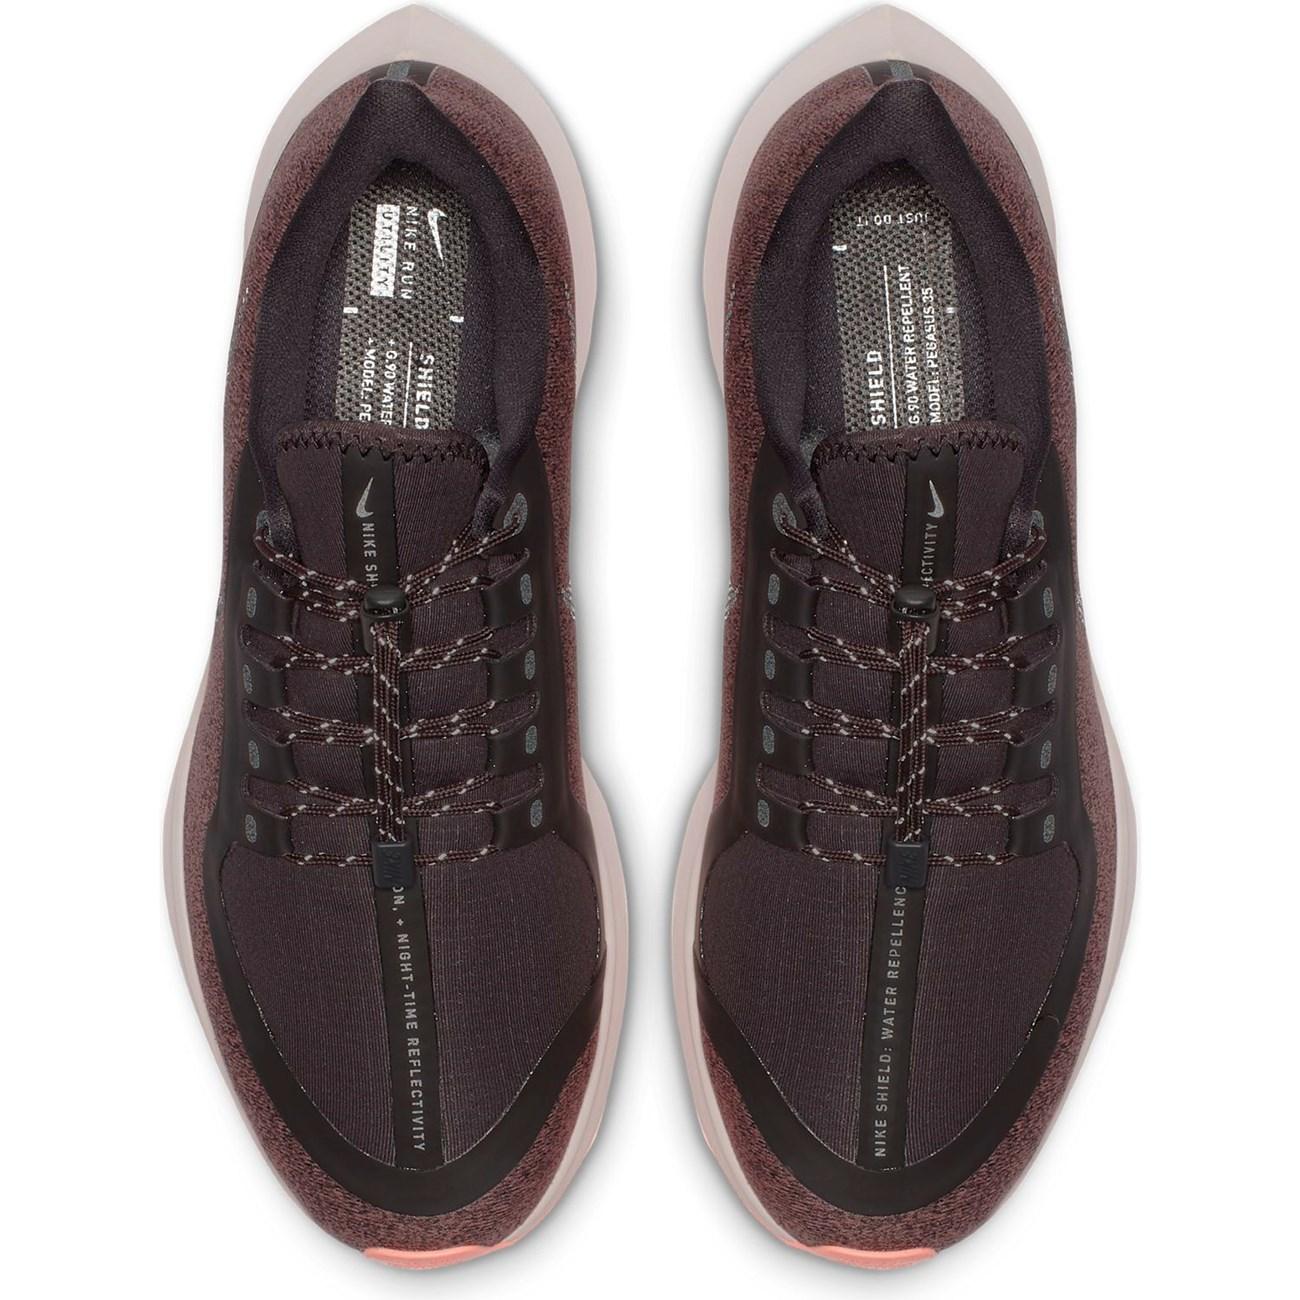 NIKE AIR ZOOM PEGASUS 35 RN SHLD W   Παπούτσια για Τρέξιμο  52b6809103f